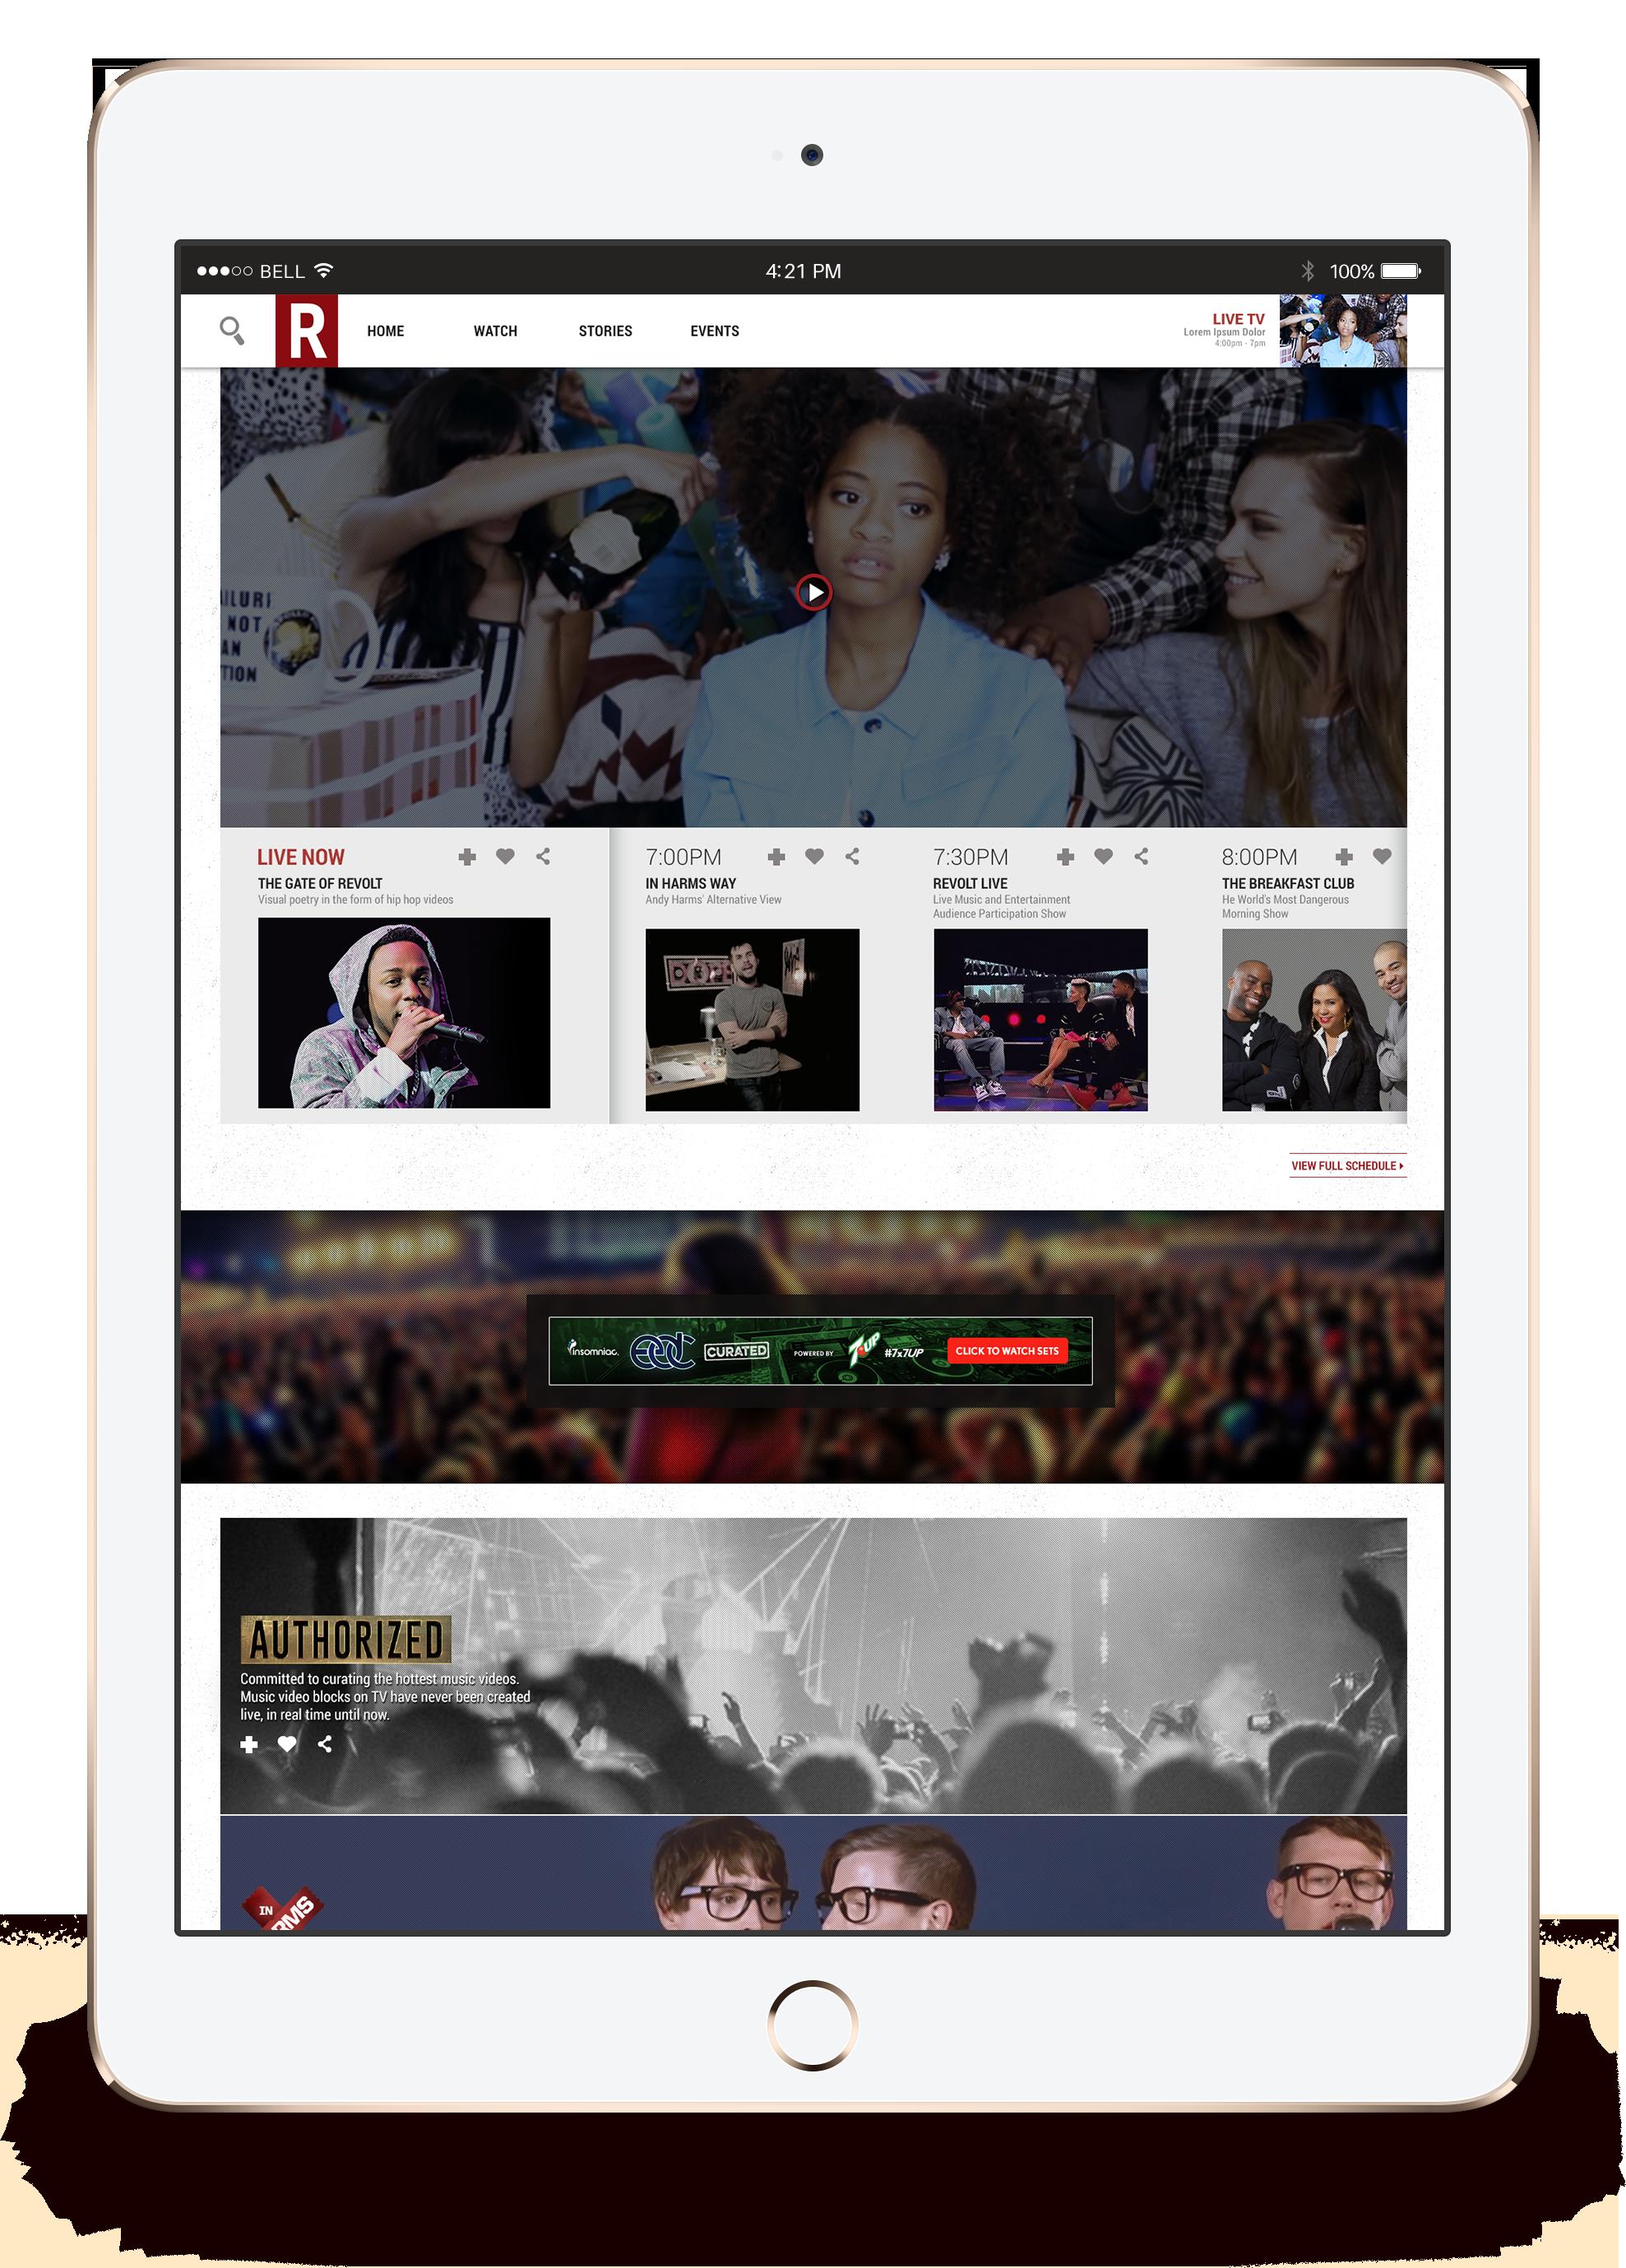 Revolt_WatchDetail-iPad